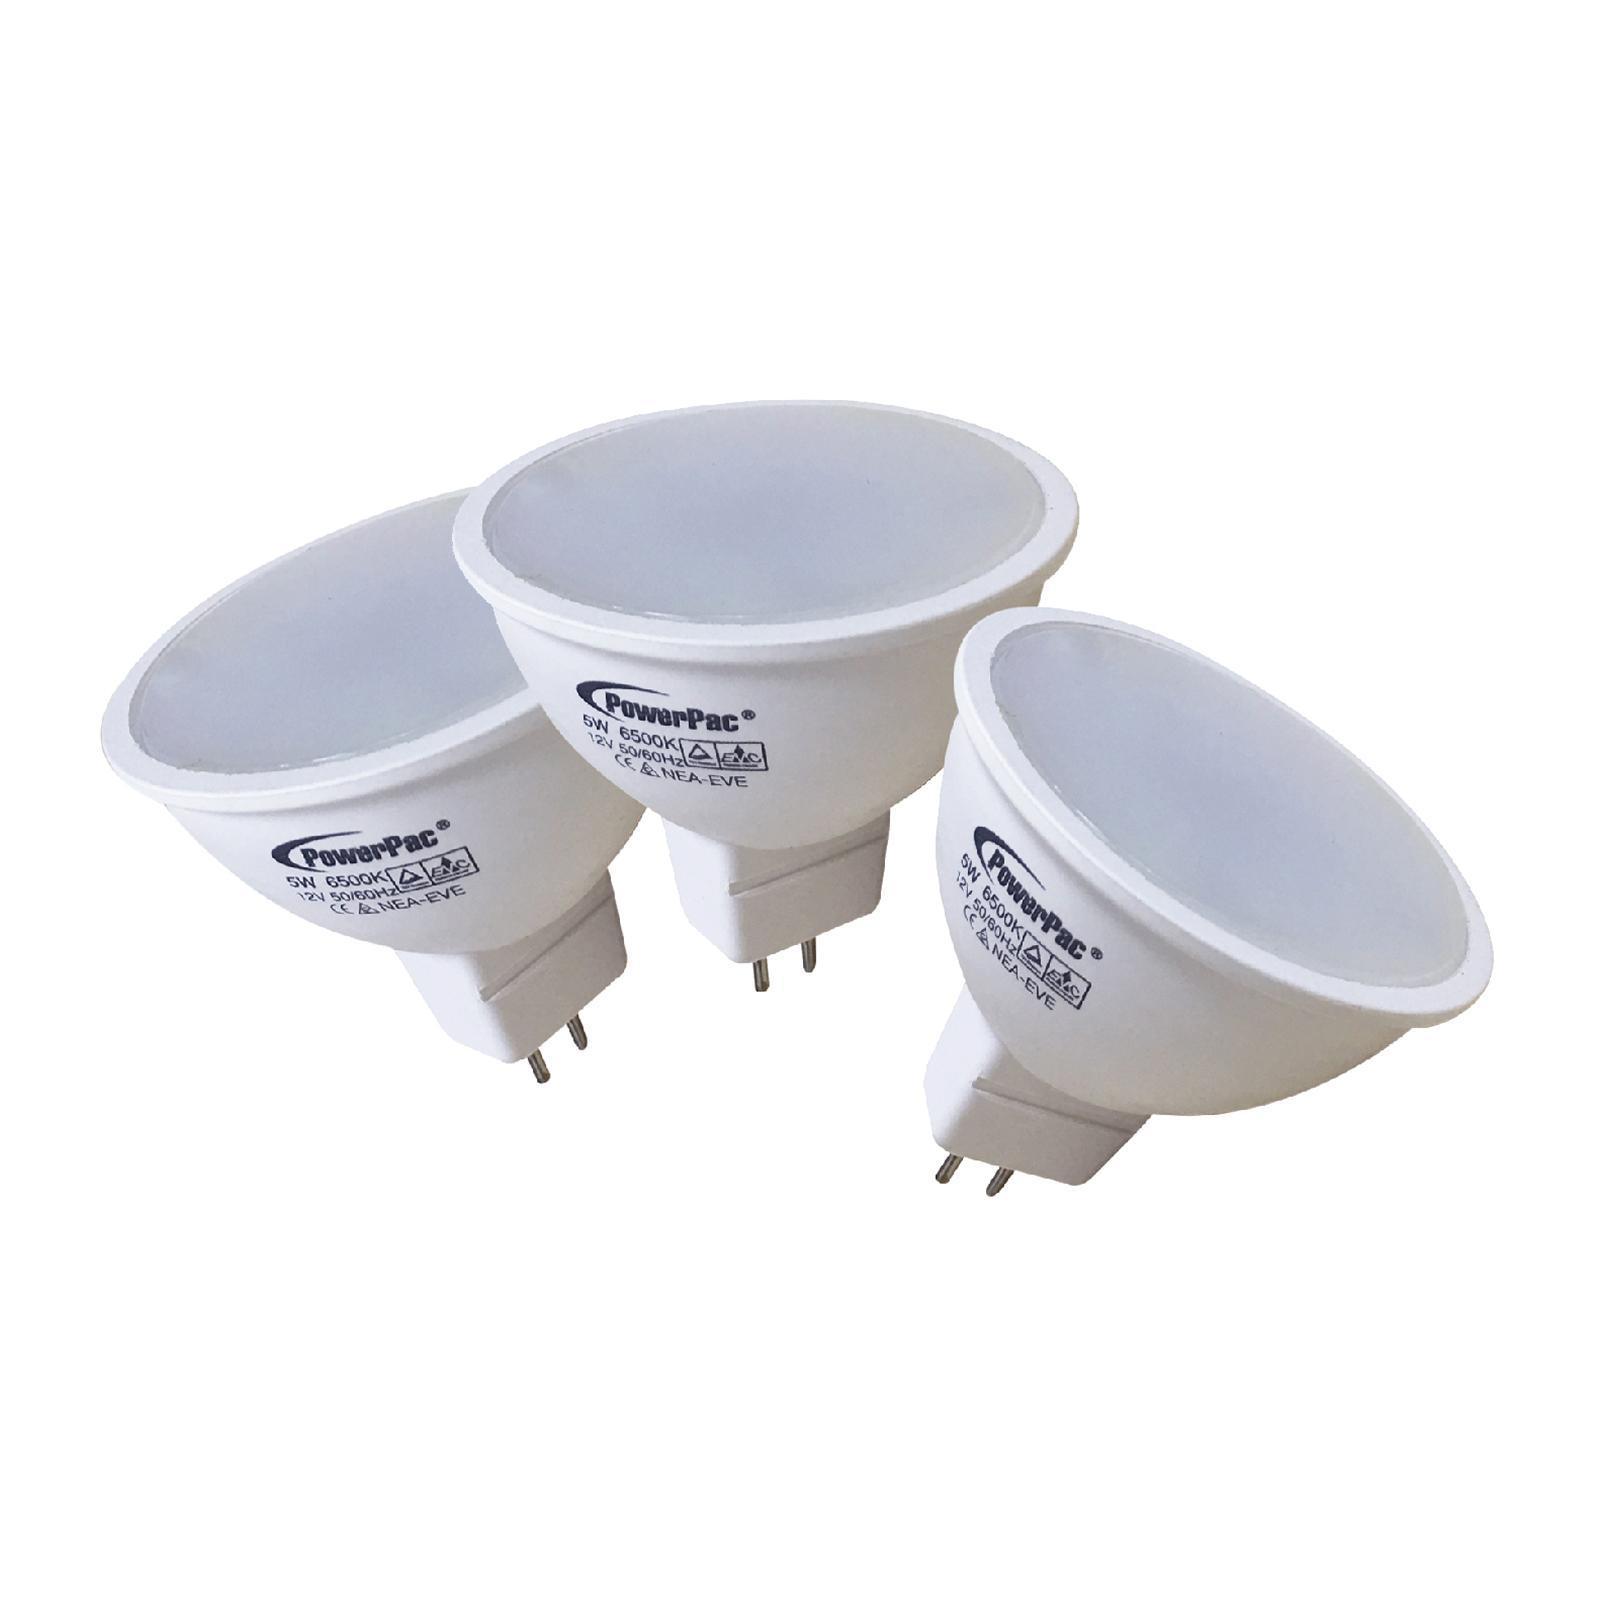 PowerPac Warm Light VERTEX LED 5W MR16 (PP6306WW)